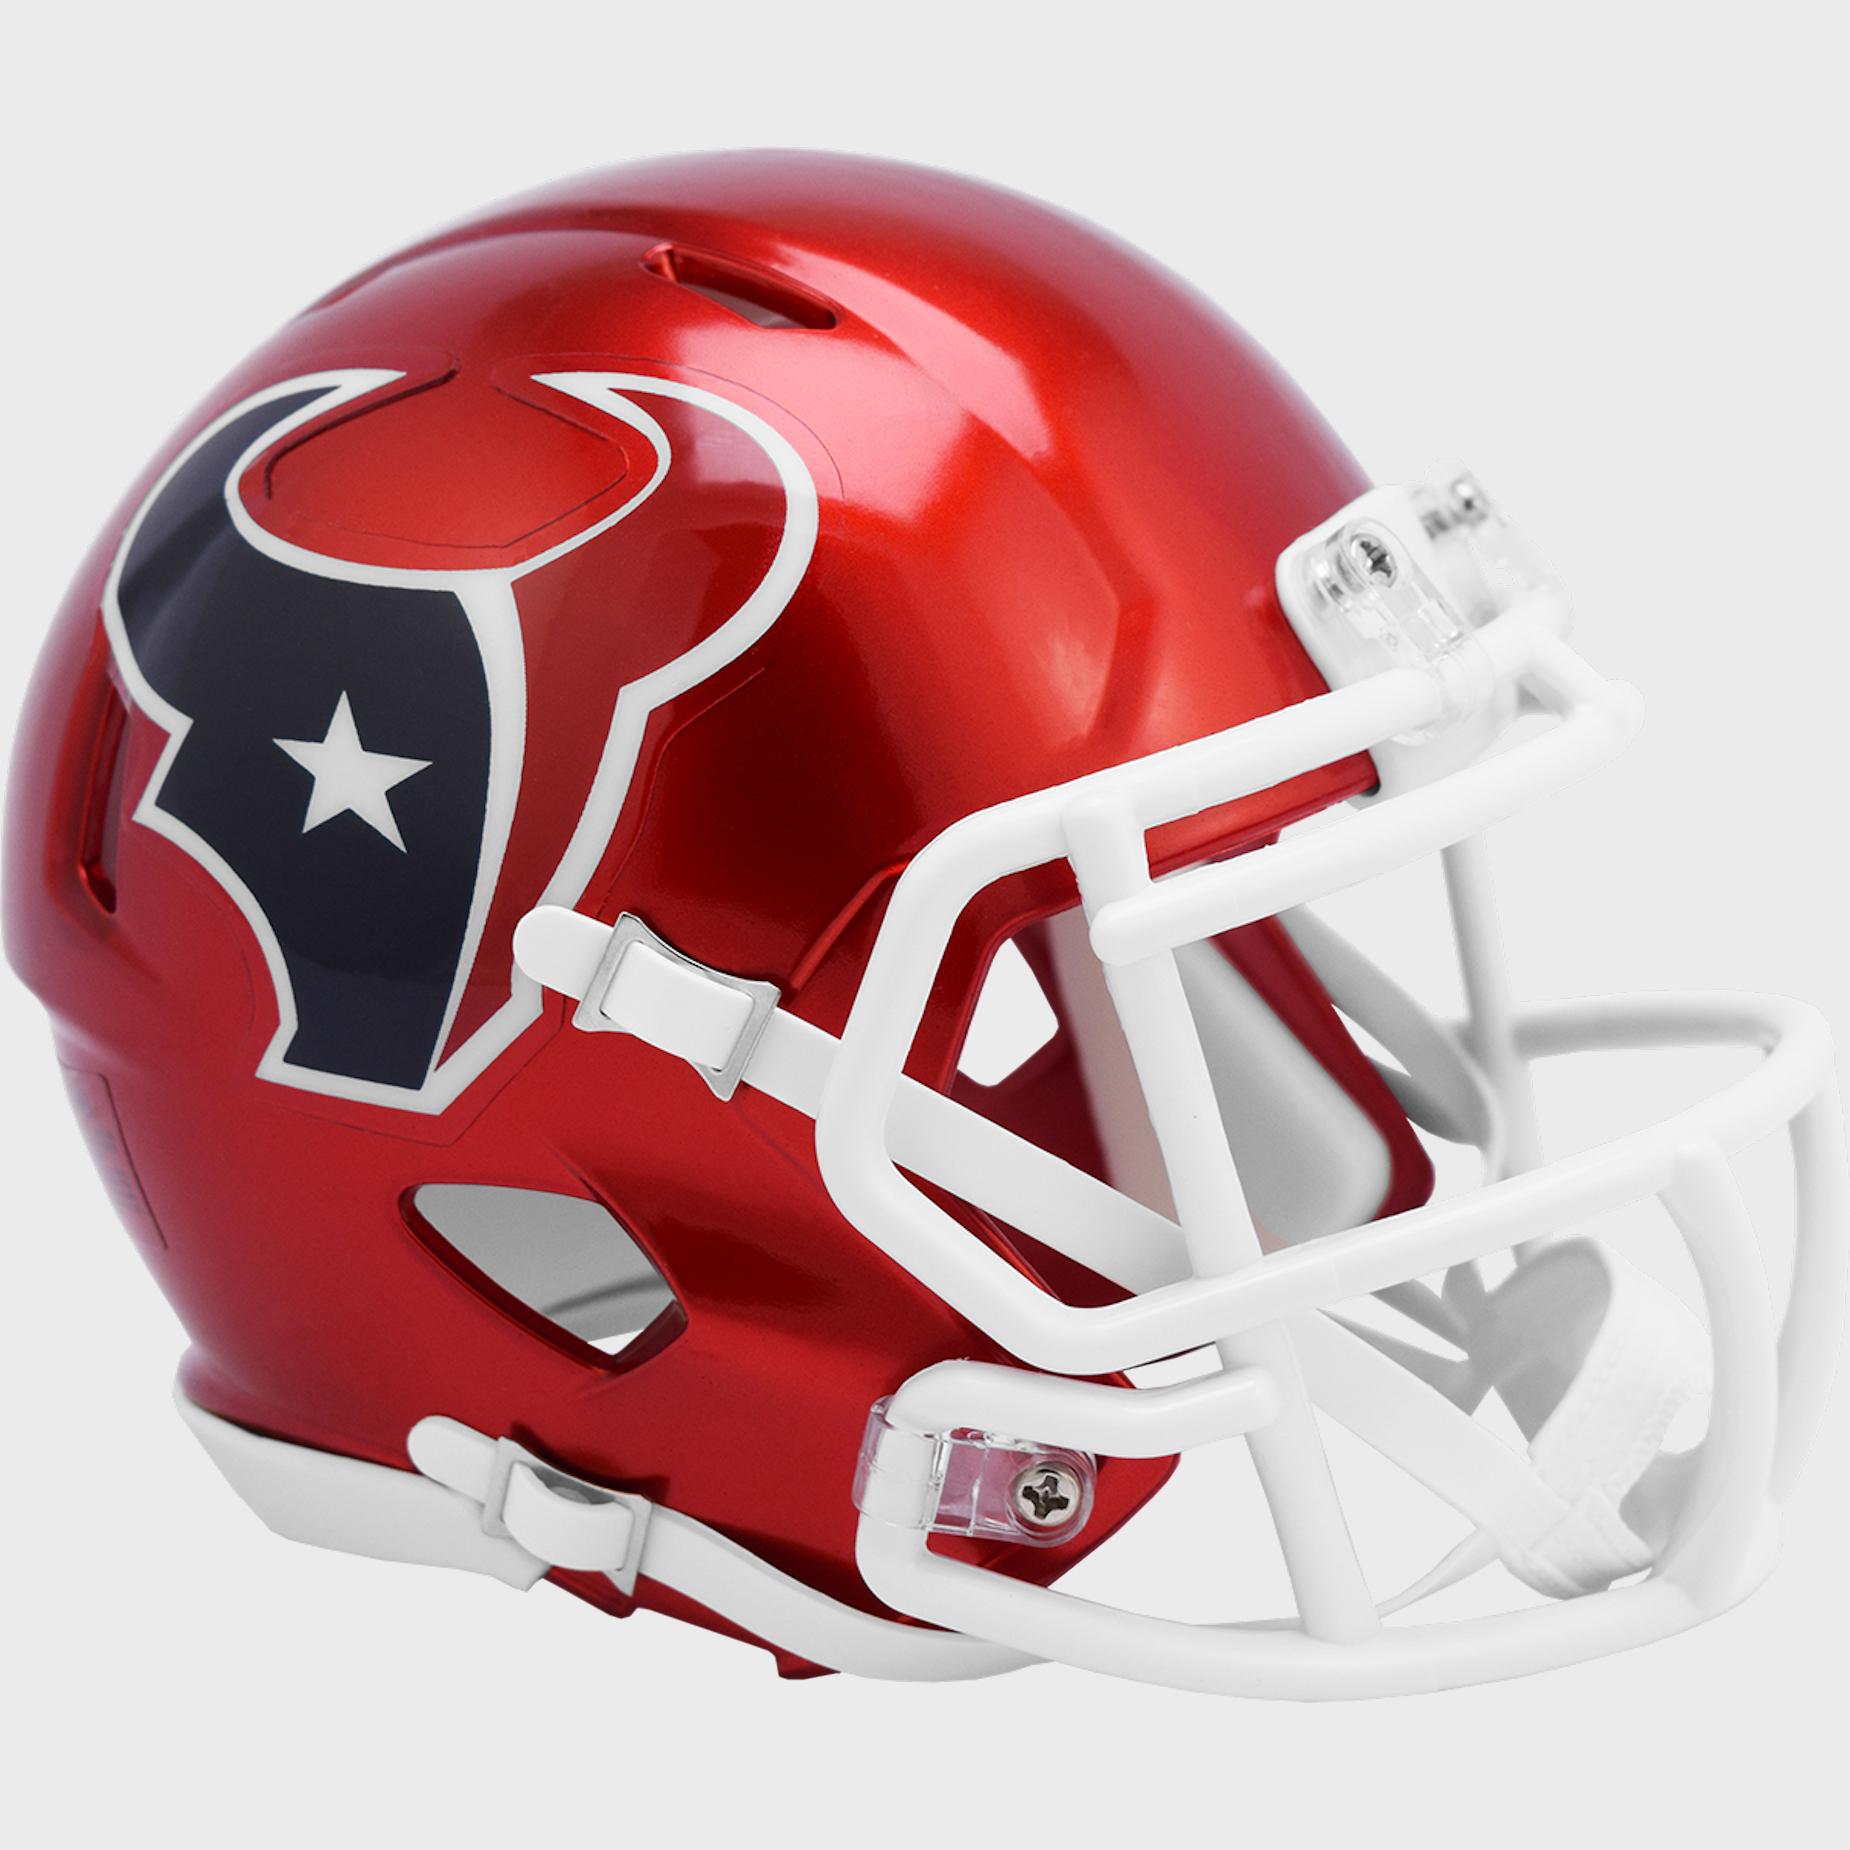 Houston Texans Speed Mini Football Helmet <B>FLASH ESD 8/21/21</B>